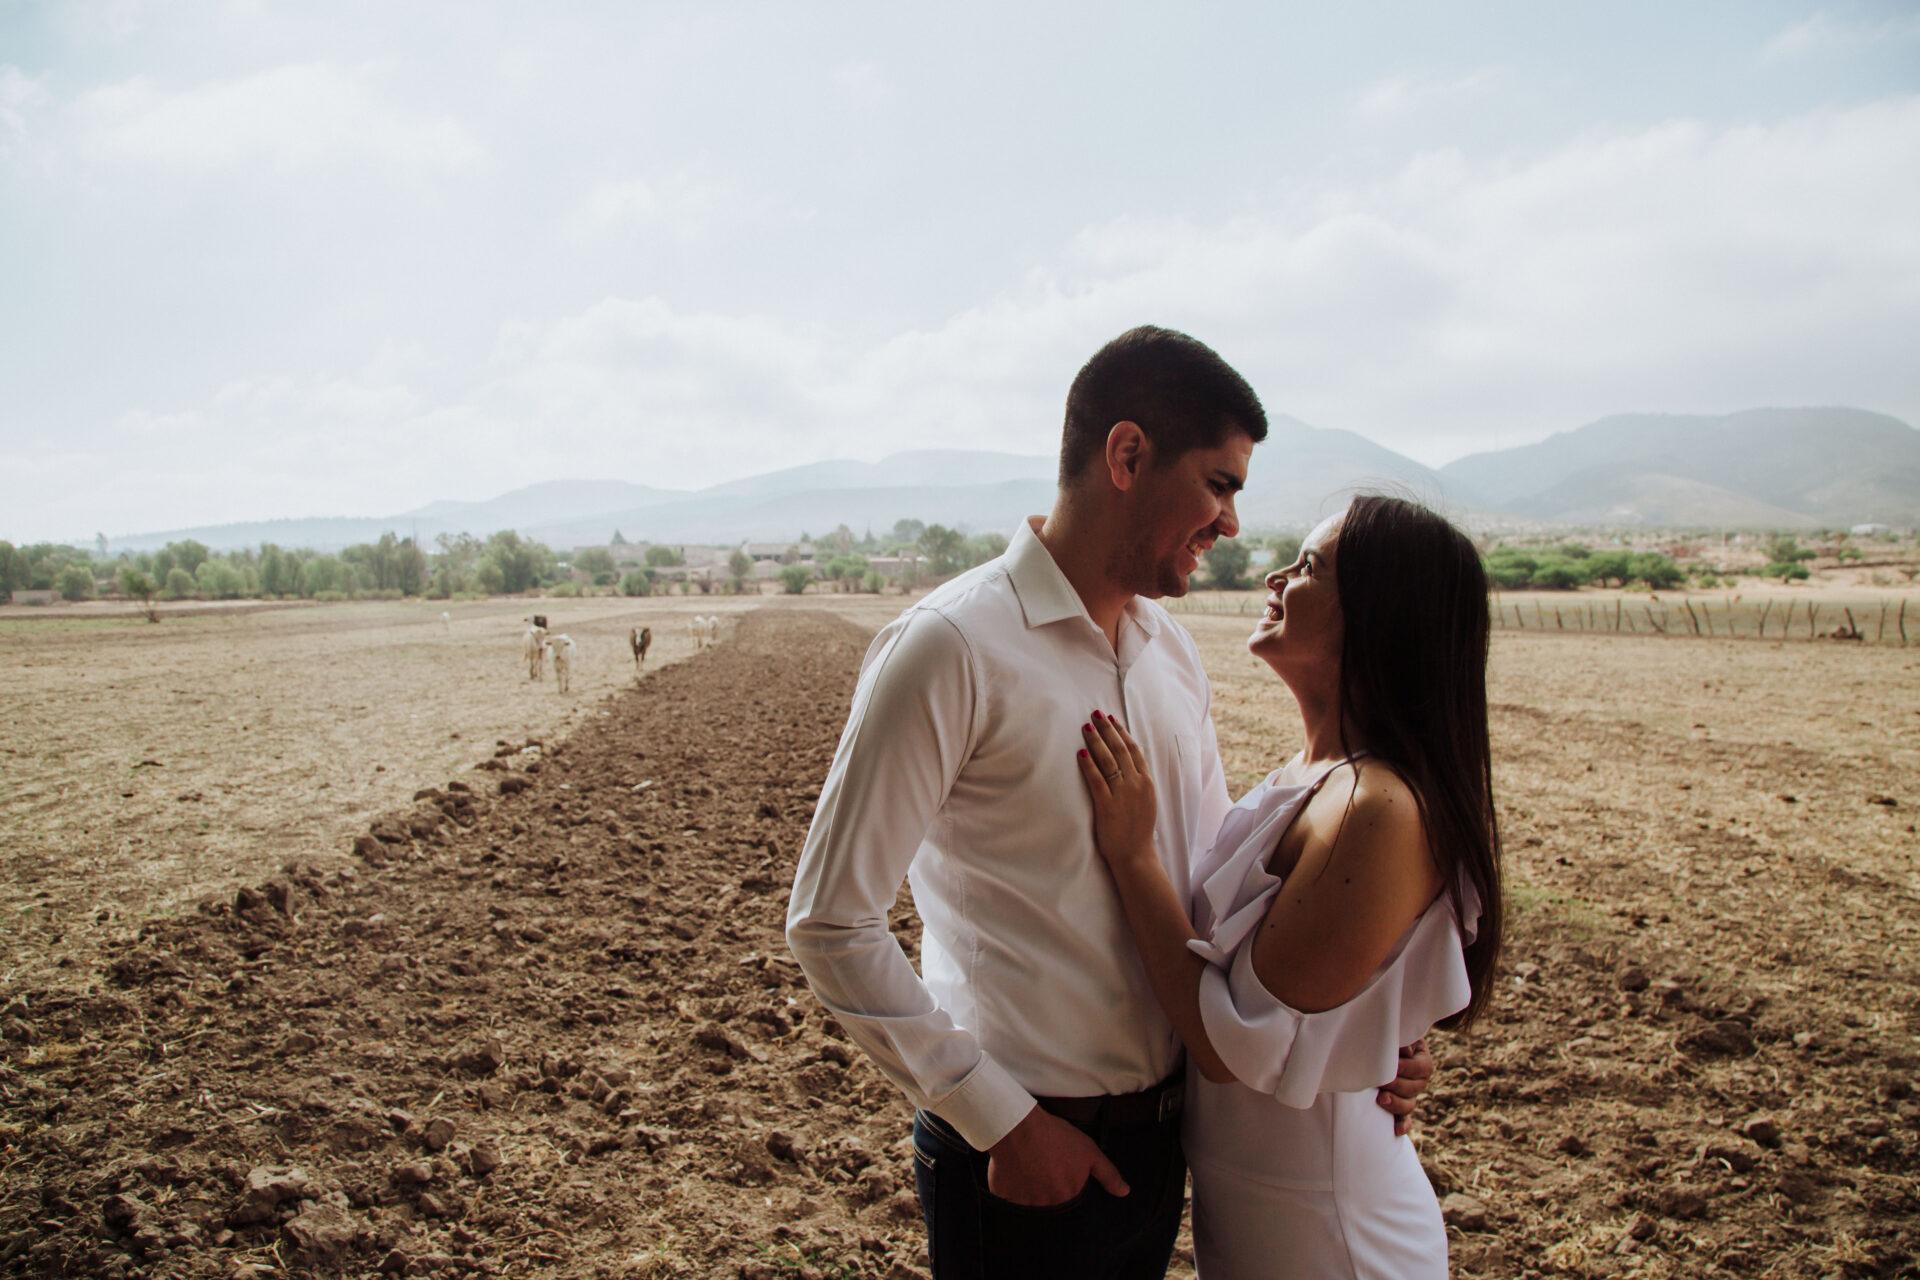 javier_noriega_fotografo_bodas_save_the_date_preboda_zacatecas_wedding_photographer17